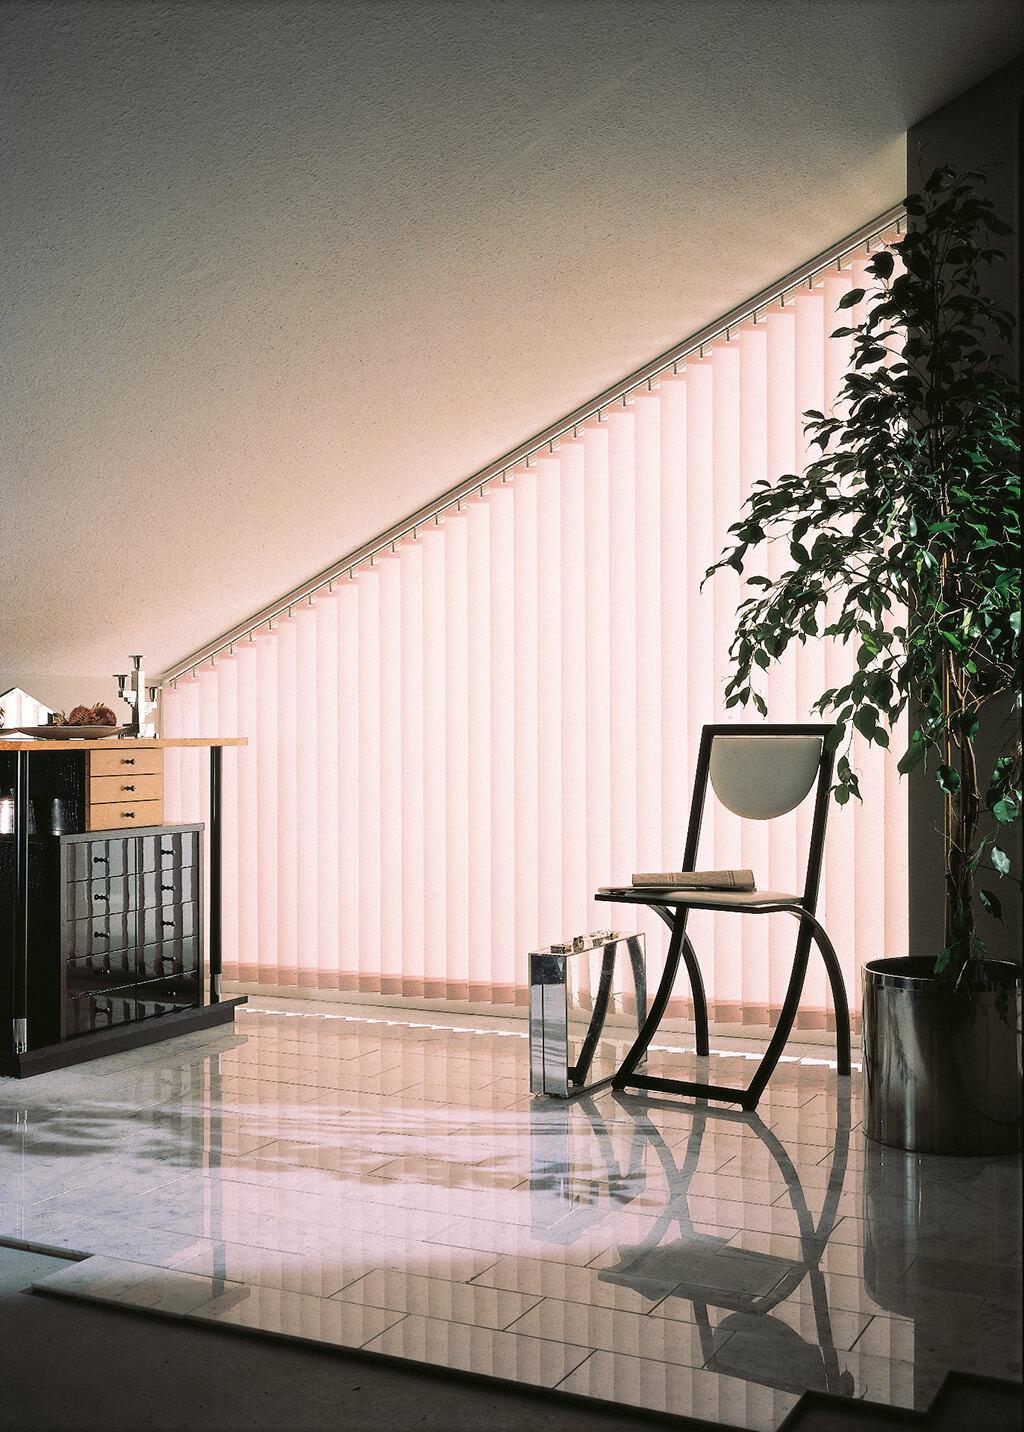 jaloucity ma anfertigungen f r alle fensterformen ob rund oder eckig. Black Bedroom Furniture Sets. Home Design Ideas